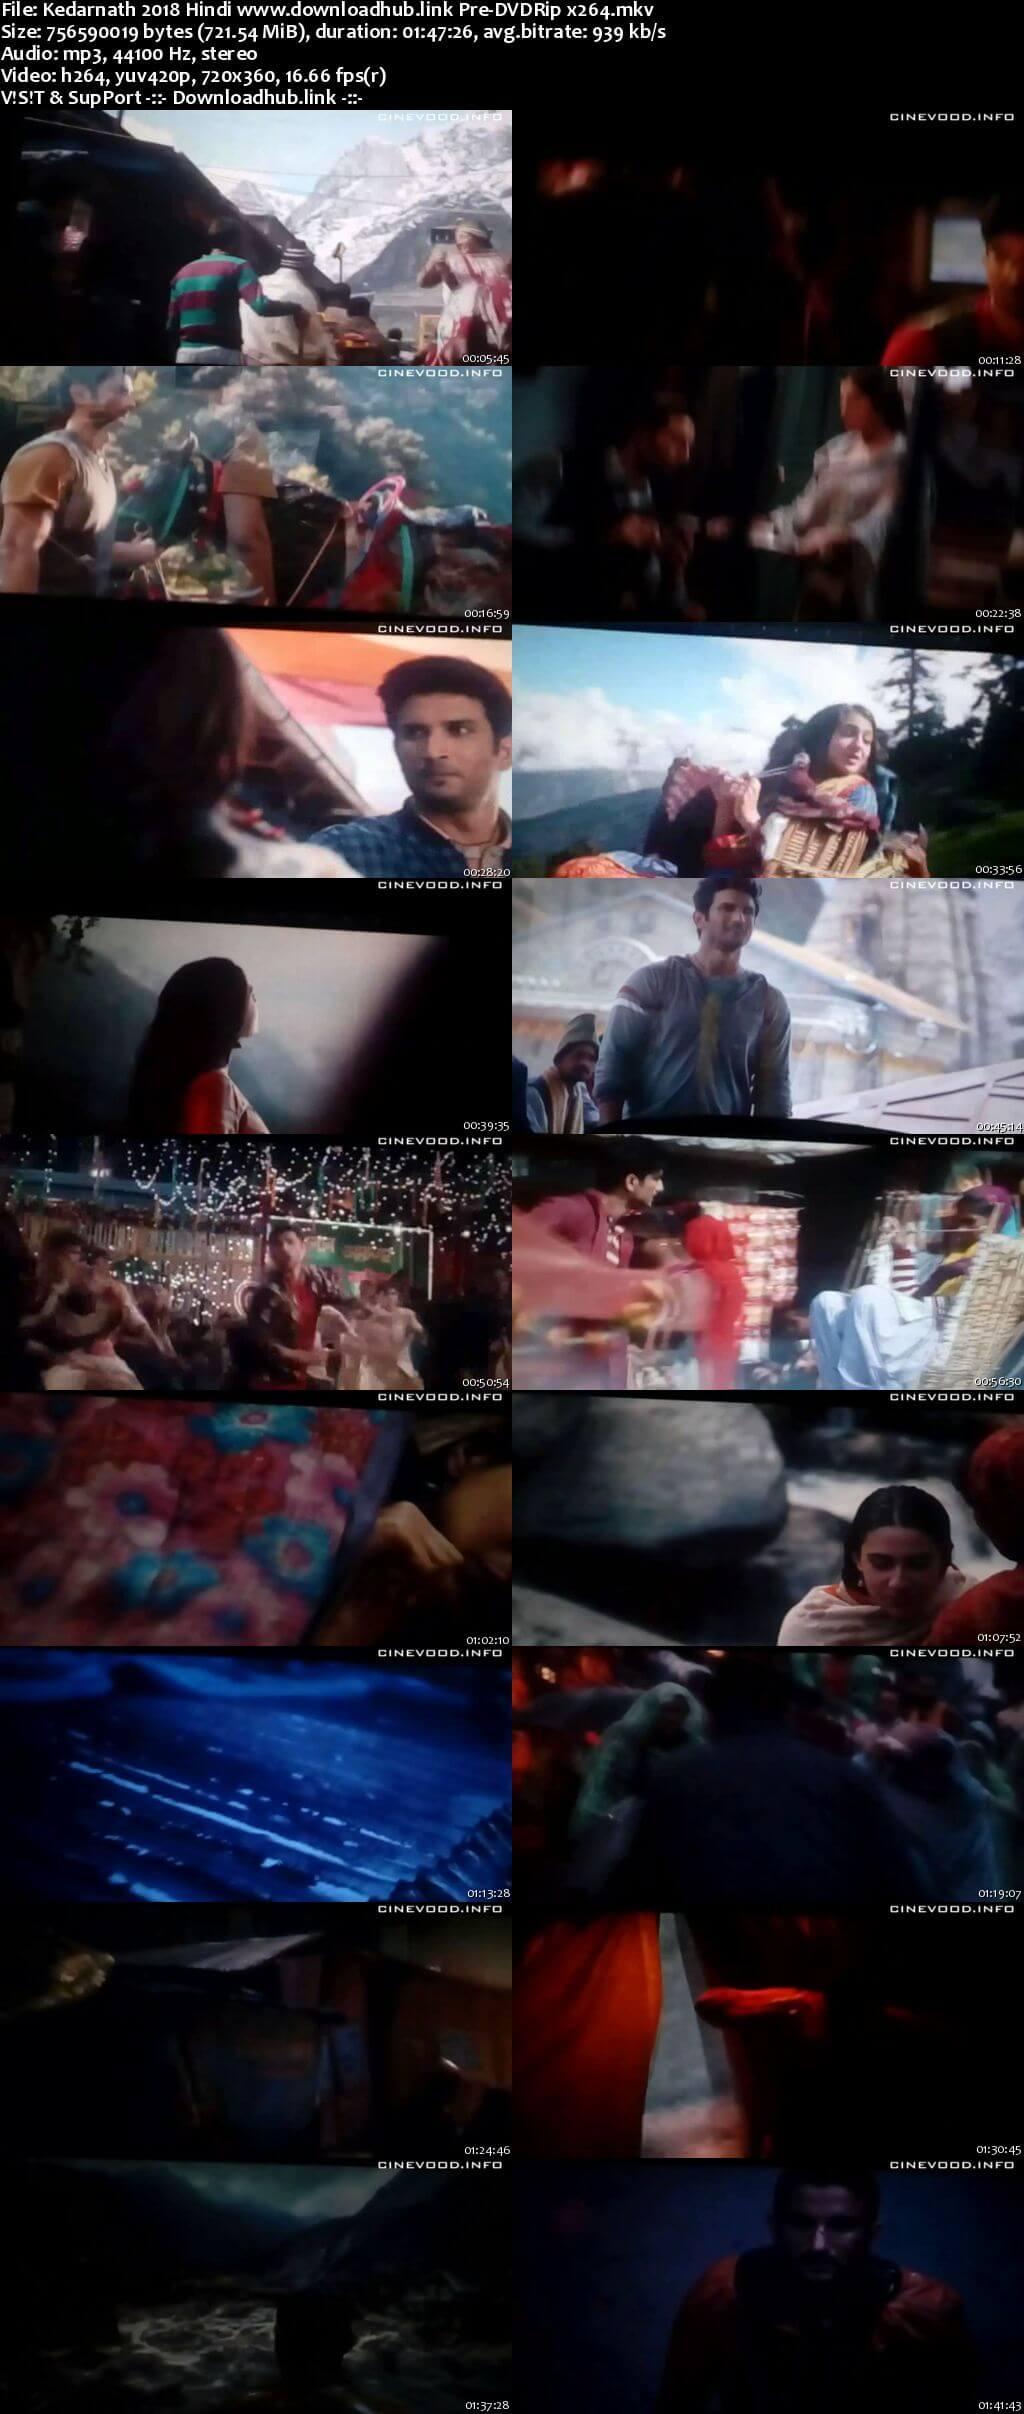 Kedarnath 2018 Hindi 700MB Pre-DVDRip x264